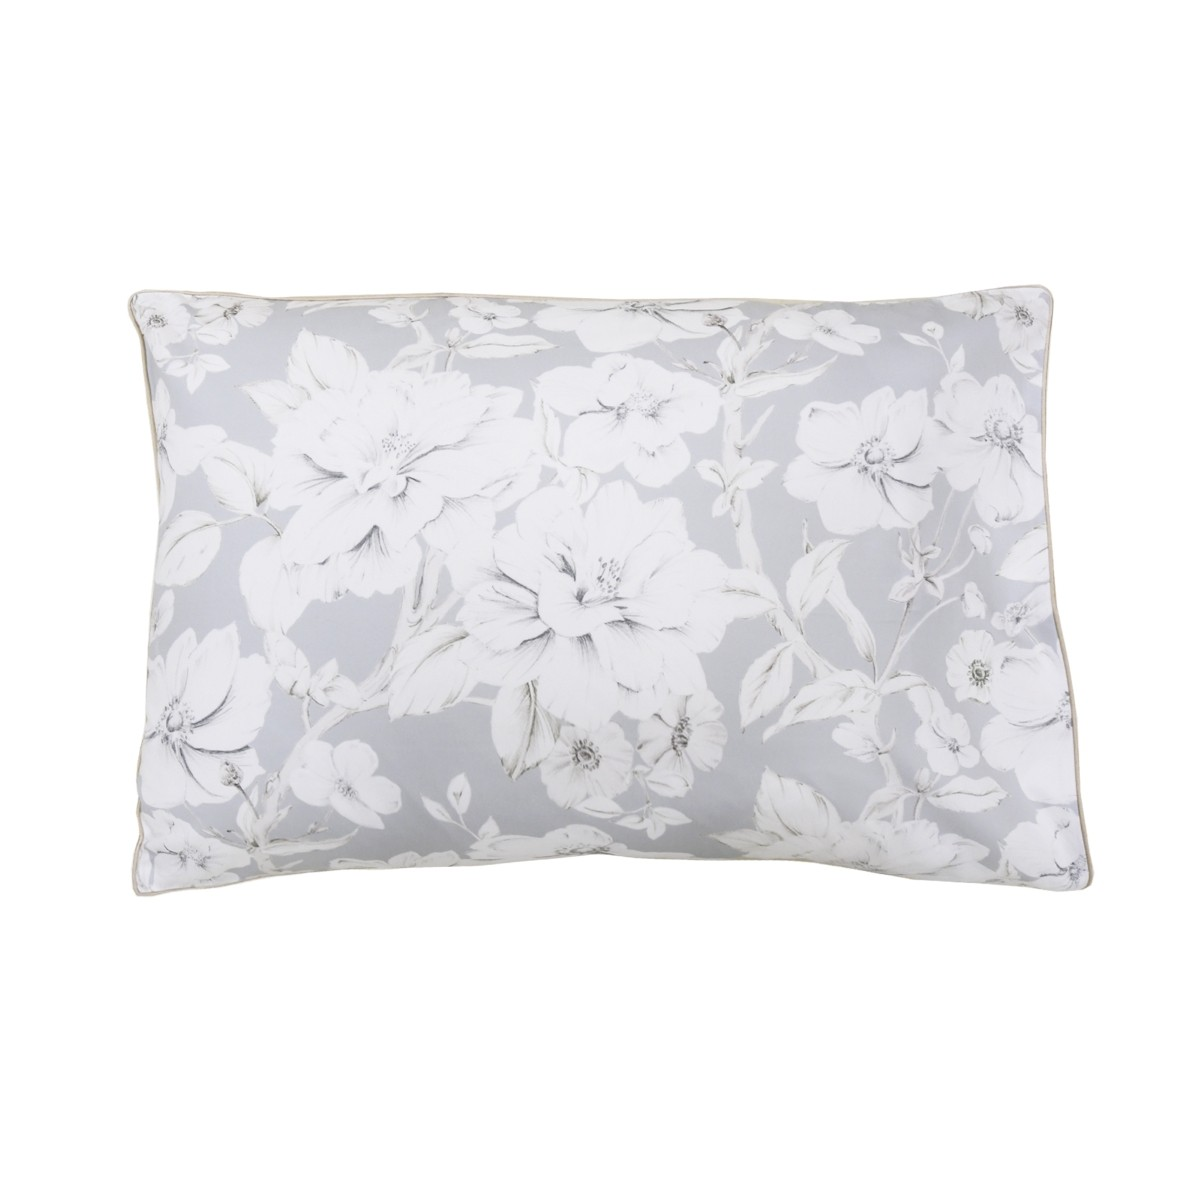 Pillowcase, LOTUS